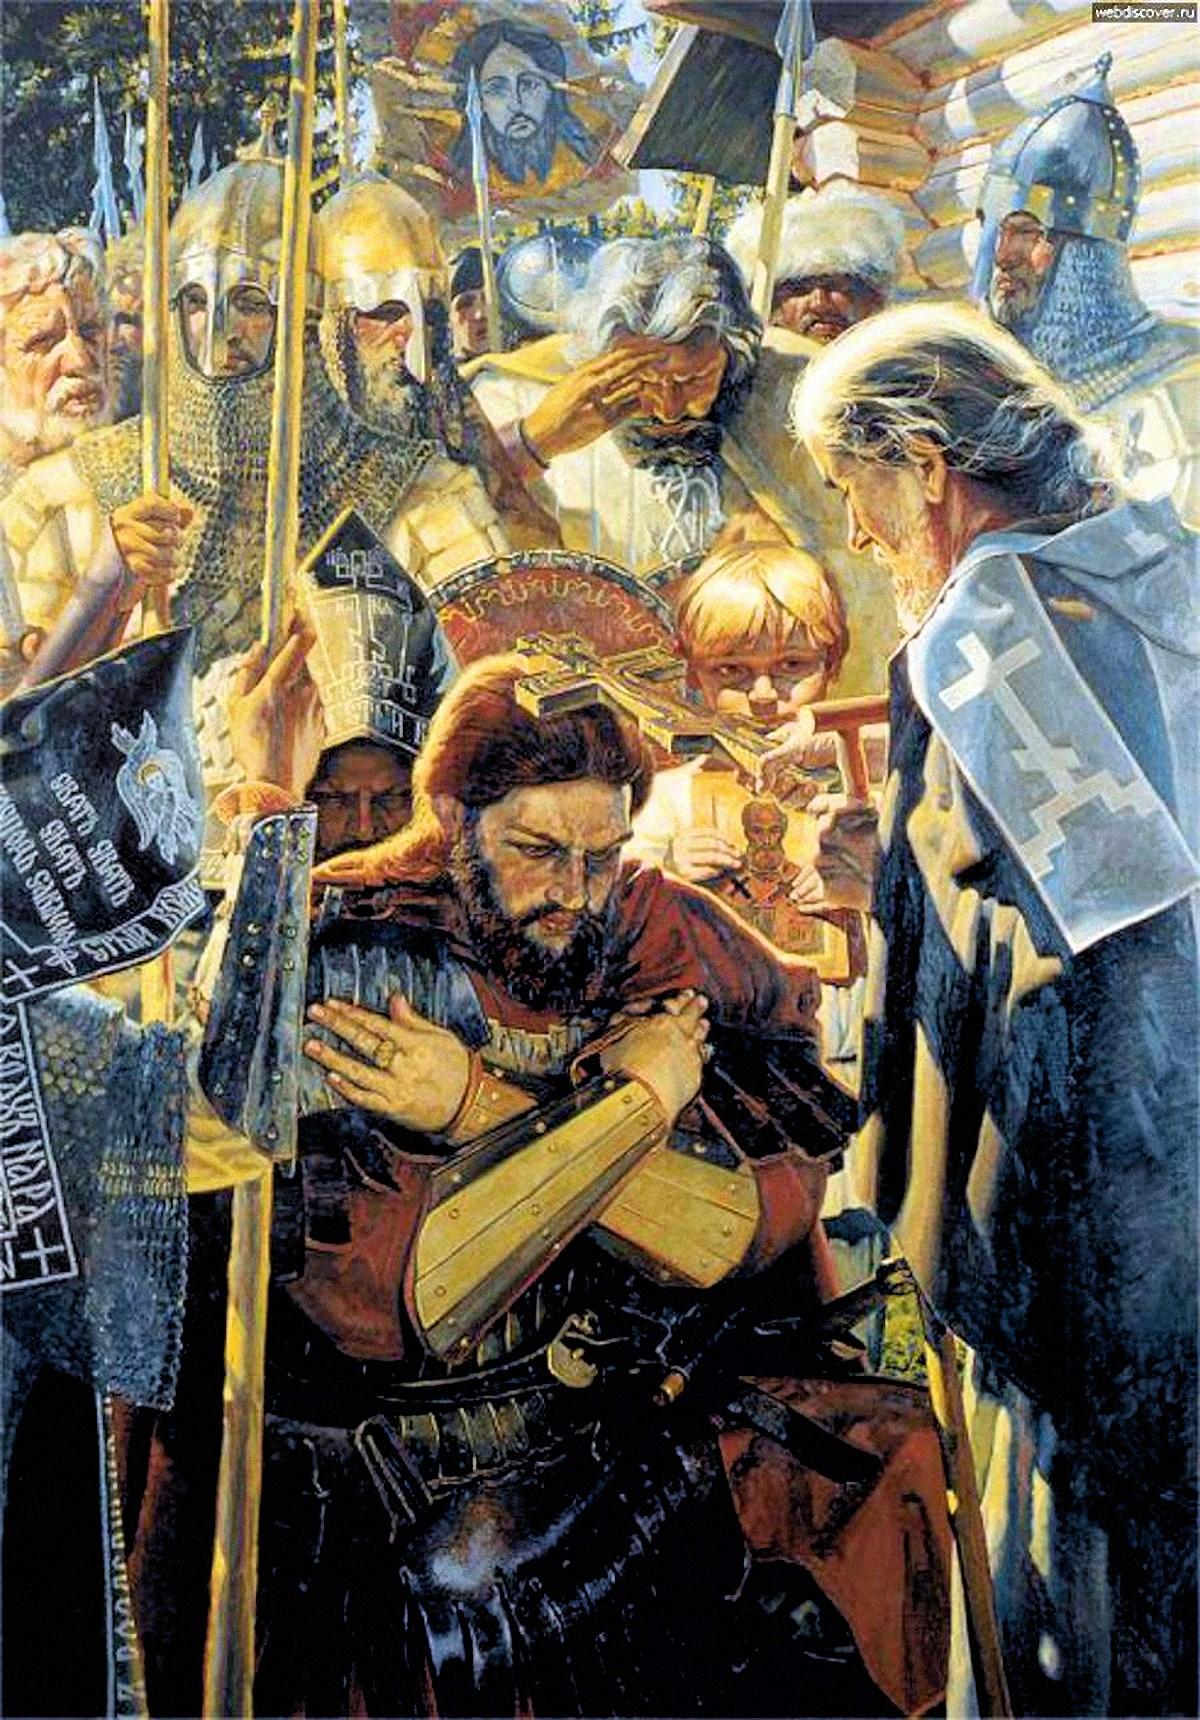 00 Igor Sushenok. Do Not Yield Russian Land. St Sergei Radonezhsky Blessing St Dmitri Donskoi. 2001